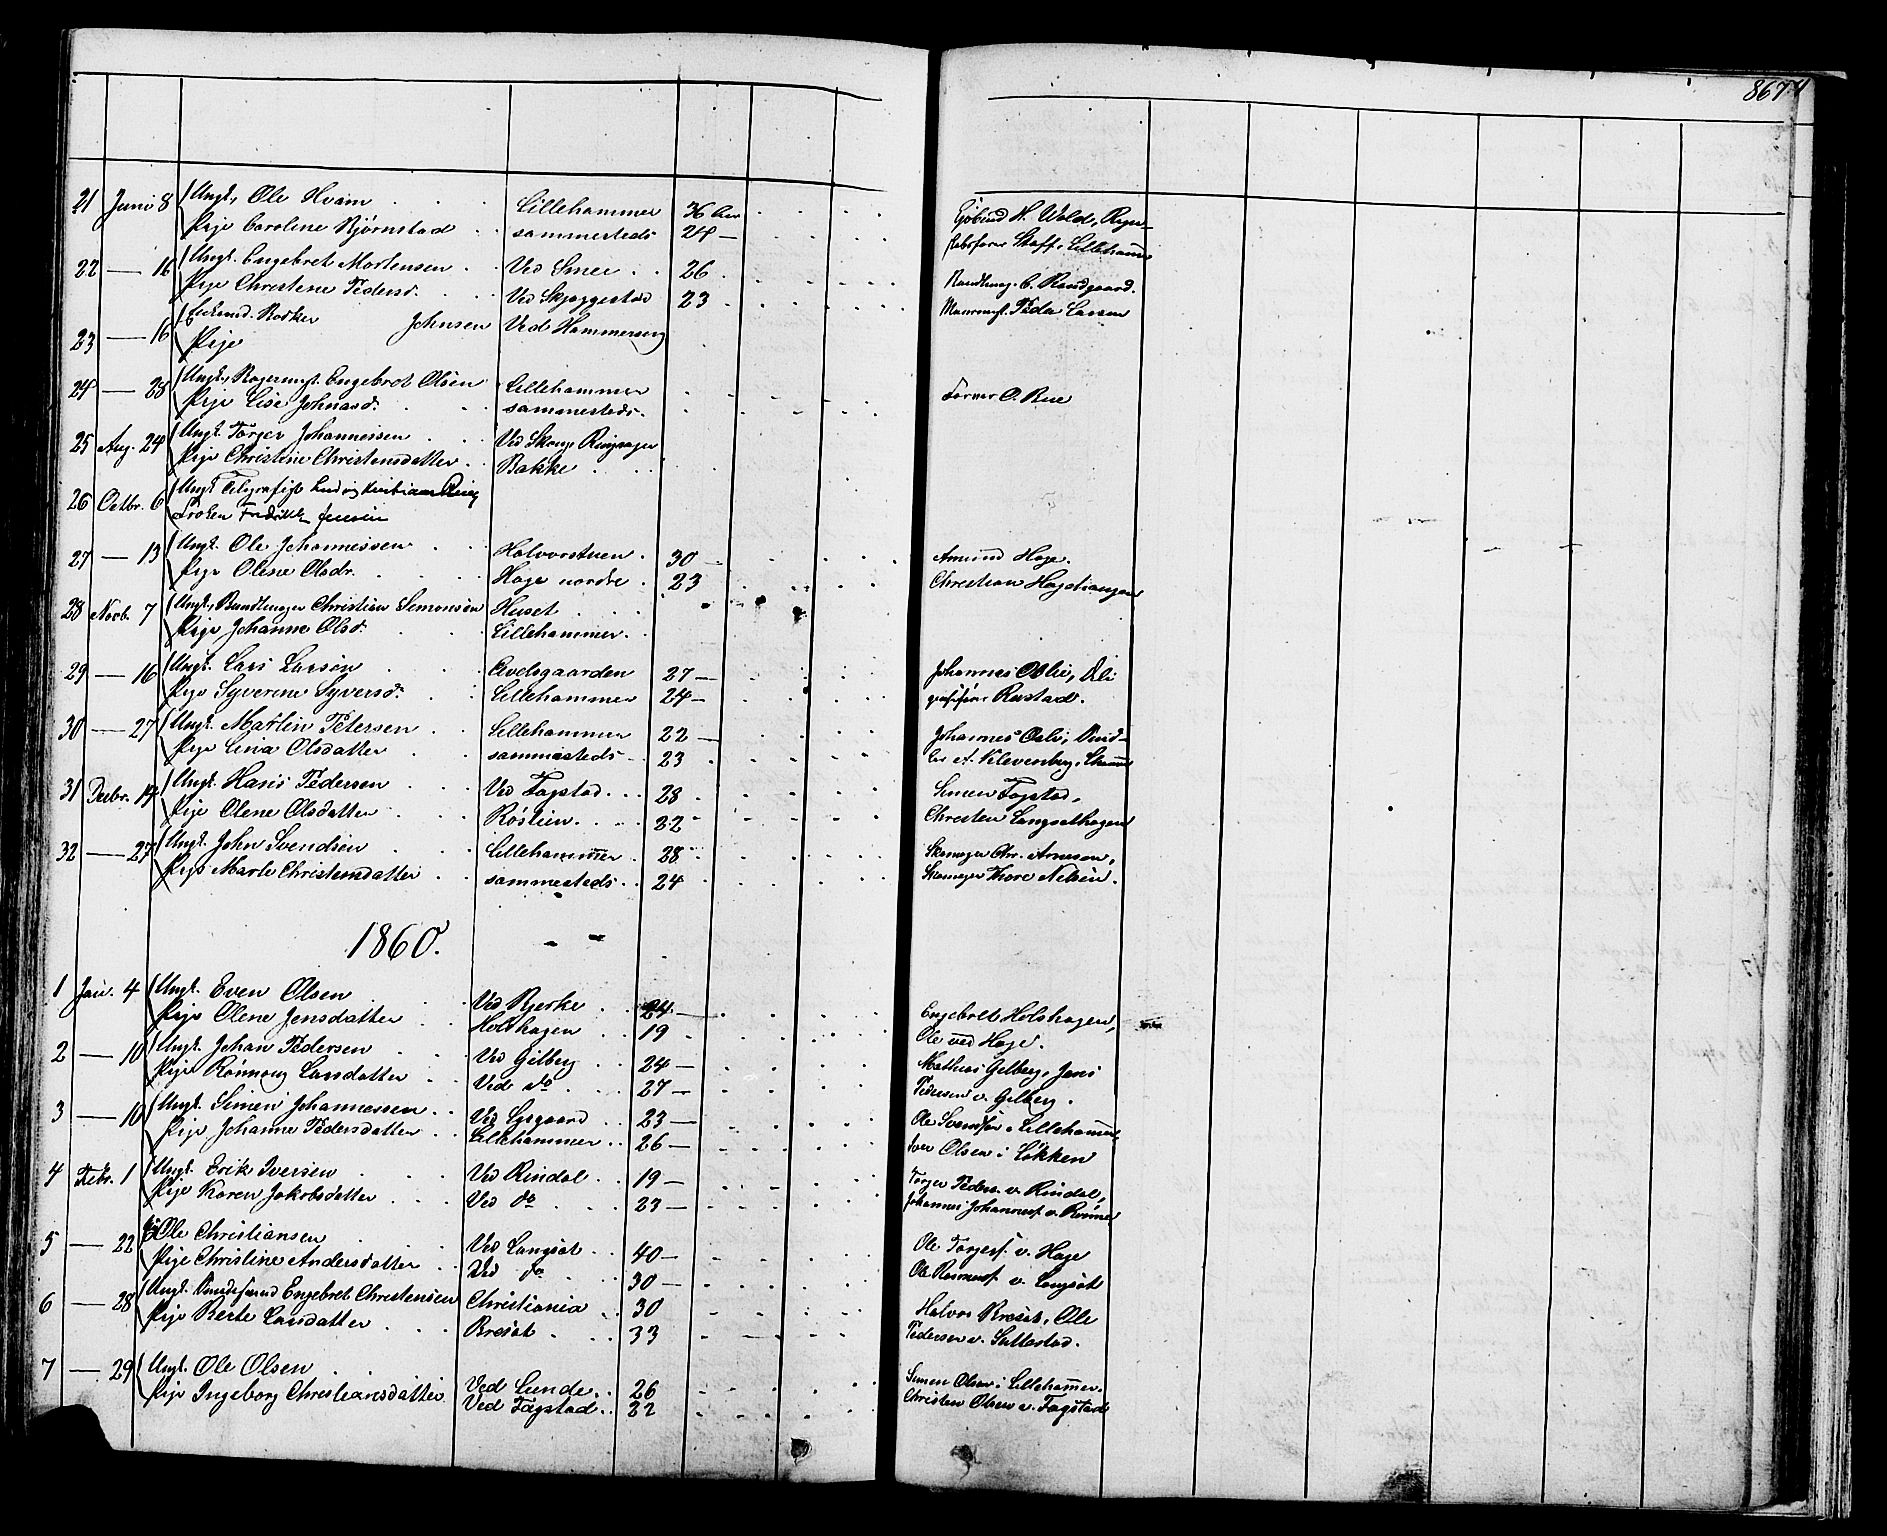 SAH, Fåberg prestekontor, Klokkerbok nr. 7, 1856-1891, s. 866-867